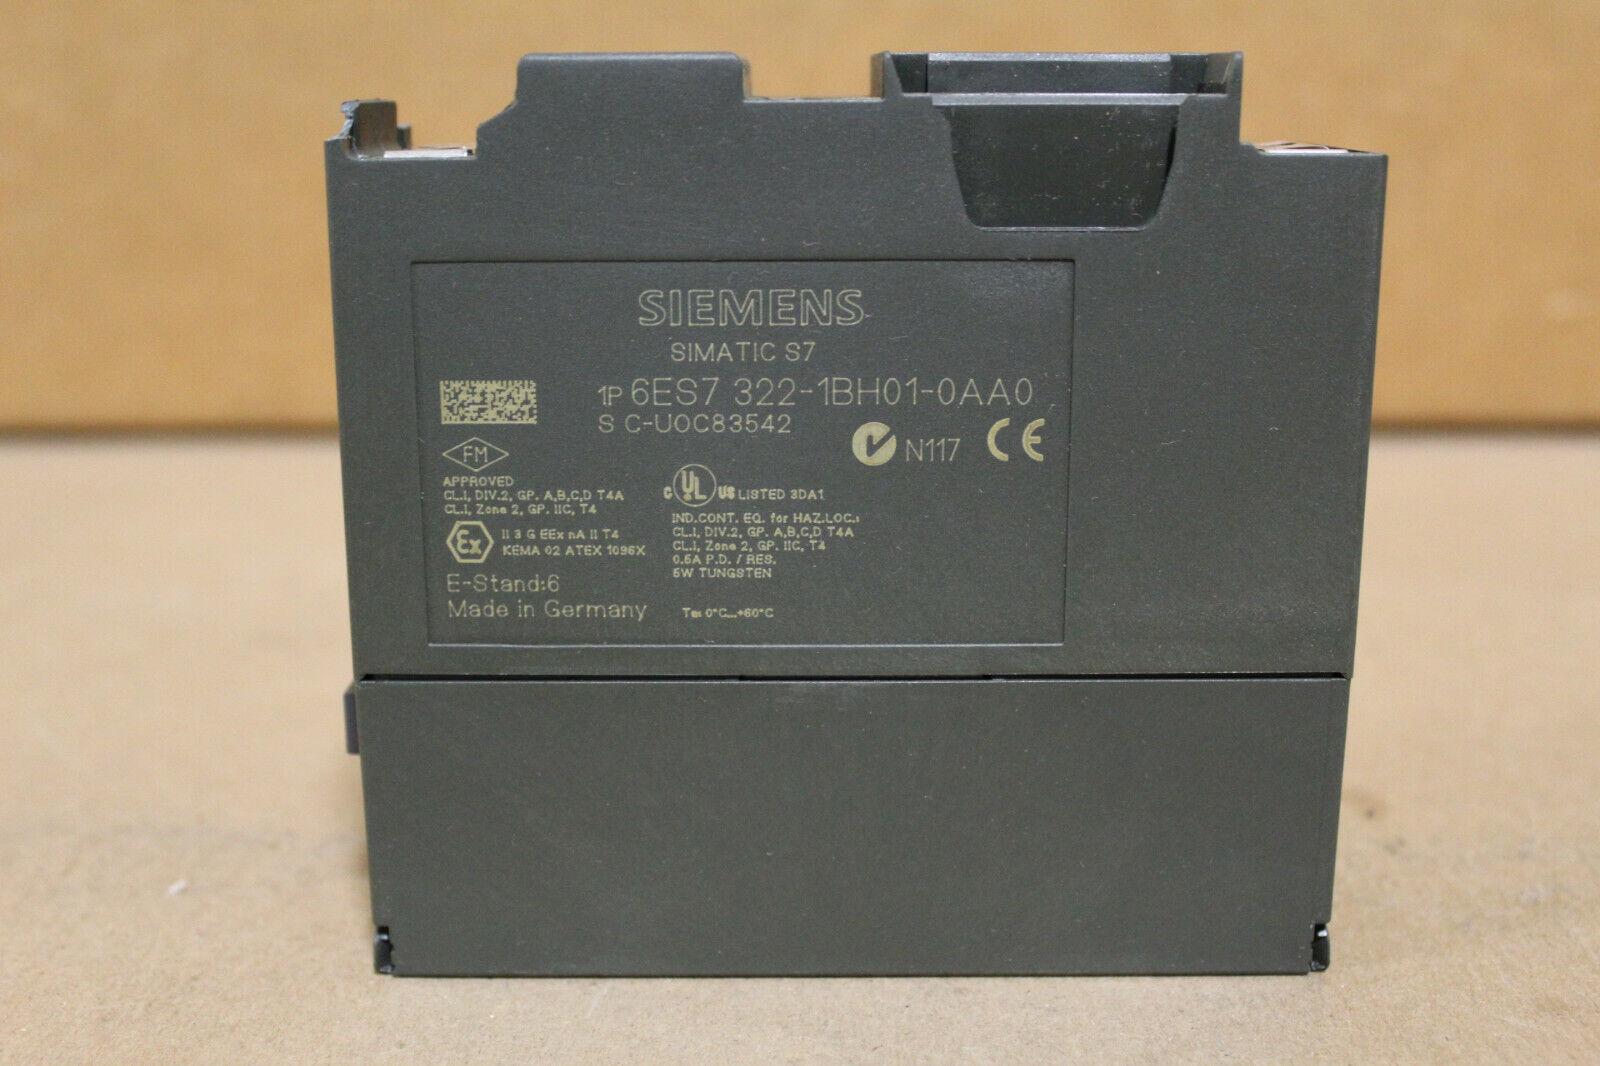 e-Stand 7 Siemens s7-salida digital SM 322-6es7 322-1bh01-0aa0